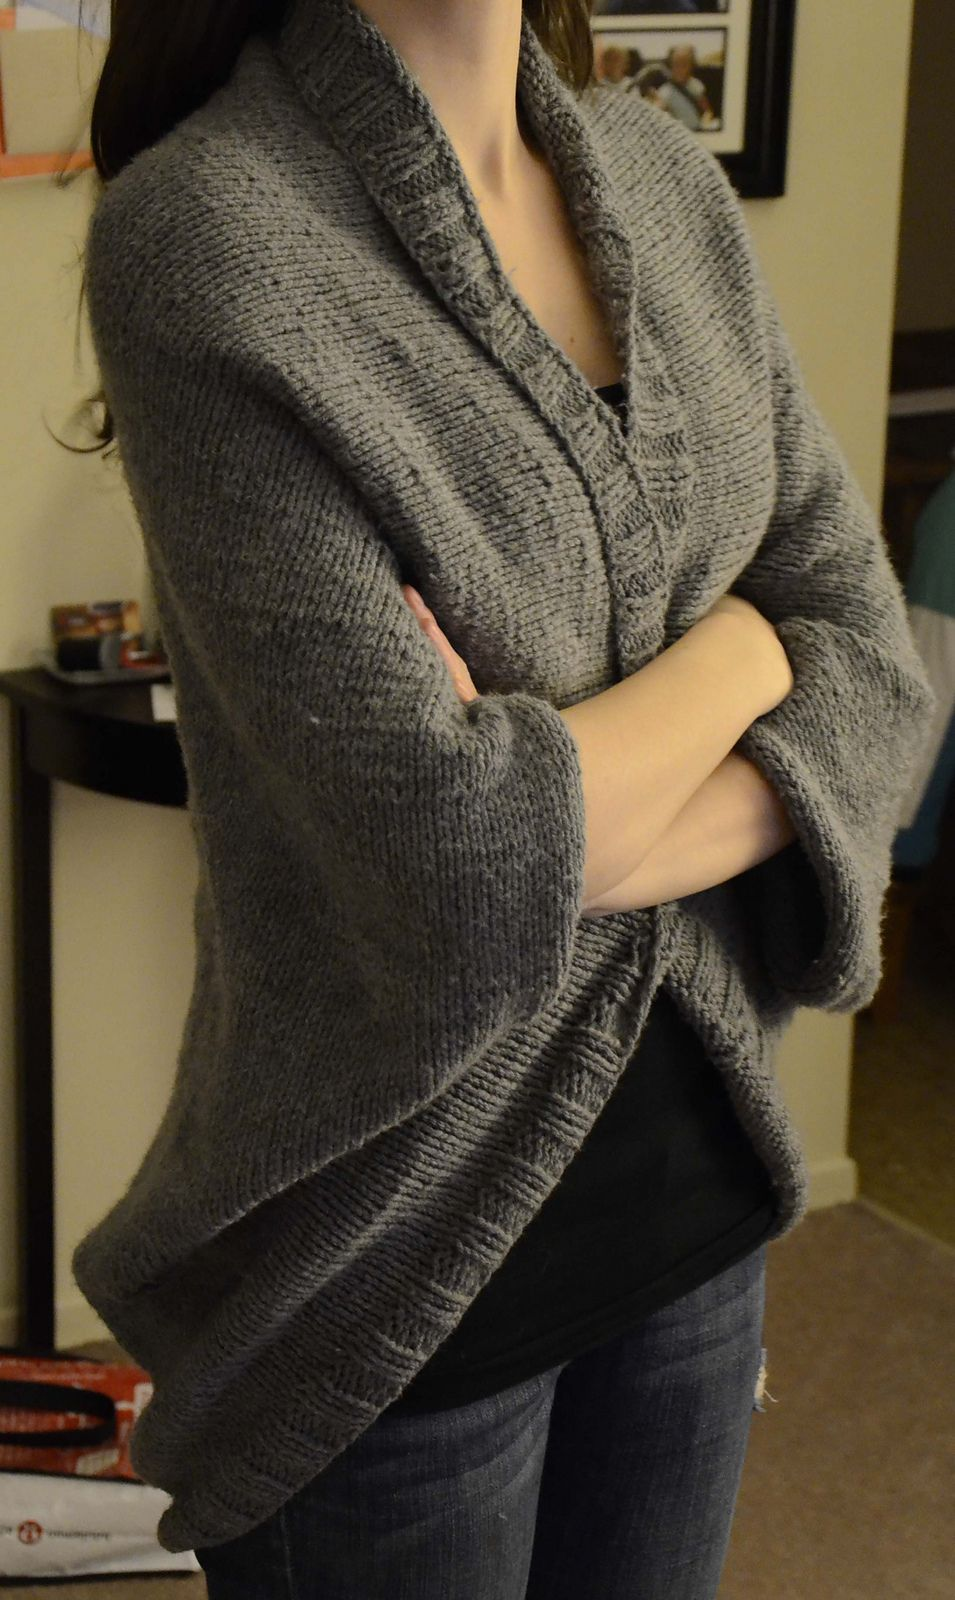 Ravelry: Speckled Shrug pattern by Lion Brand Yarn | Knit it ...